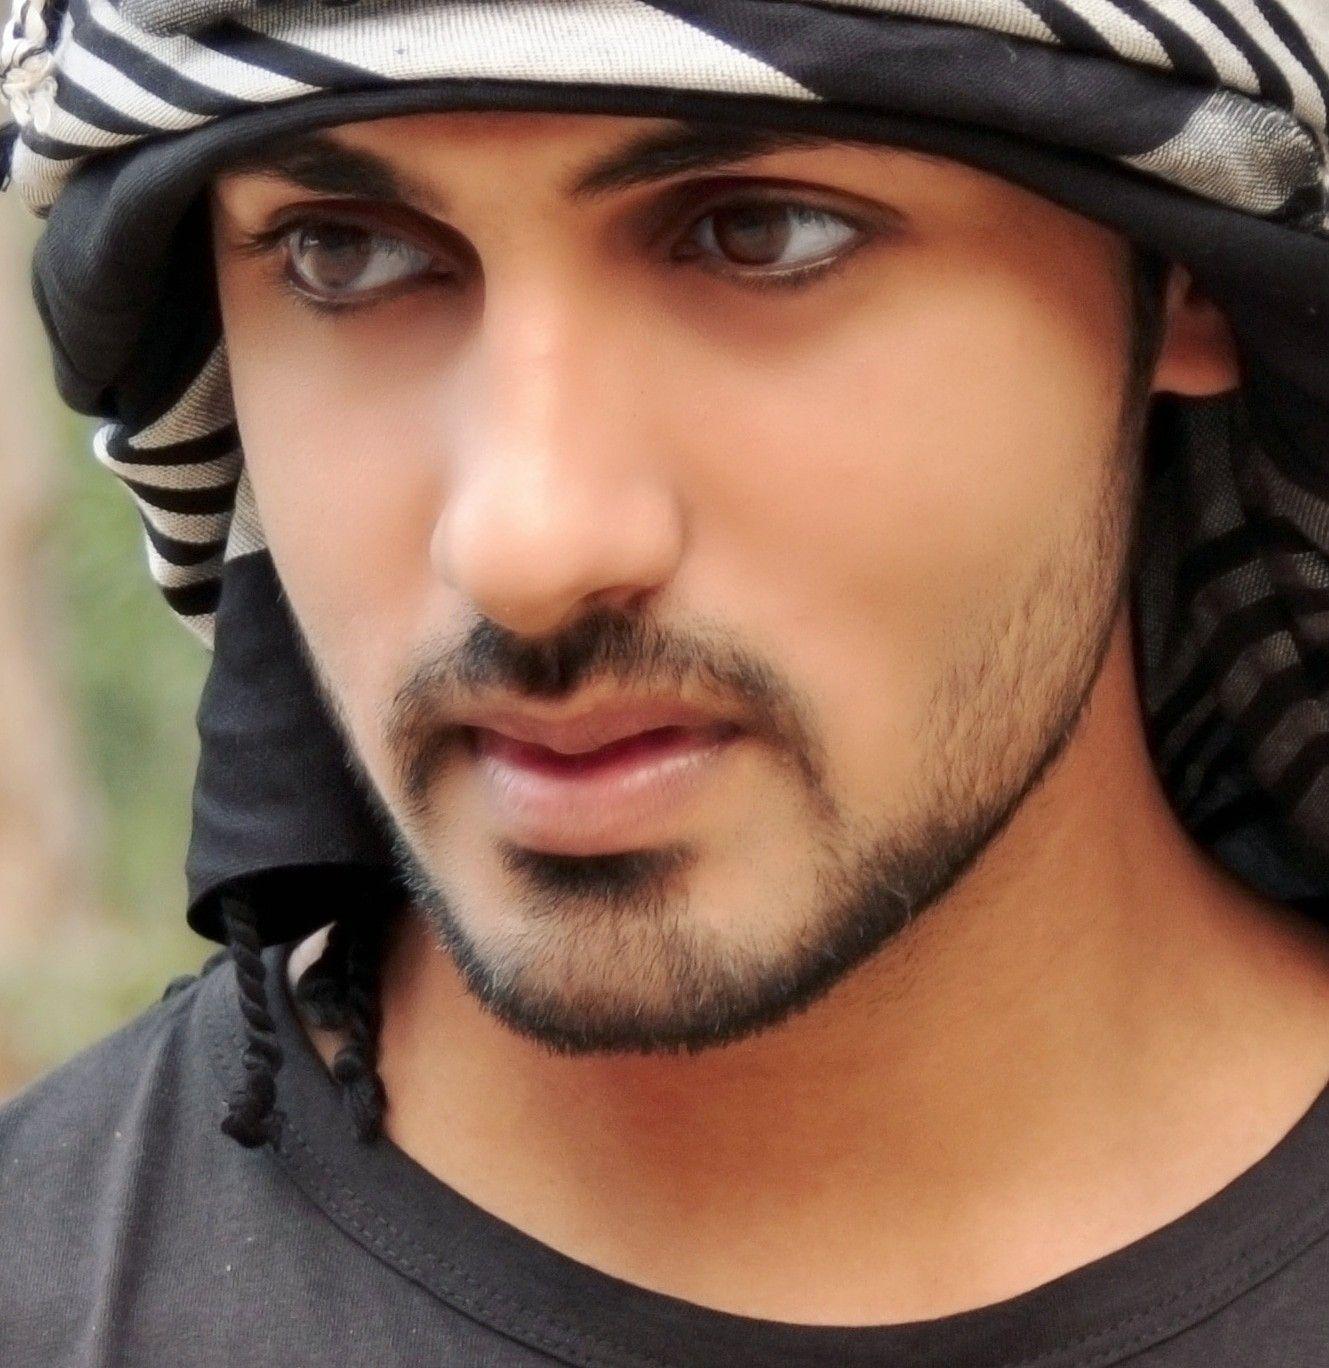 hot arabic men | Arab men, Attractive guys, East fashion